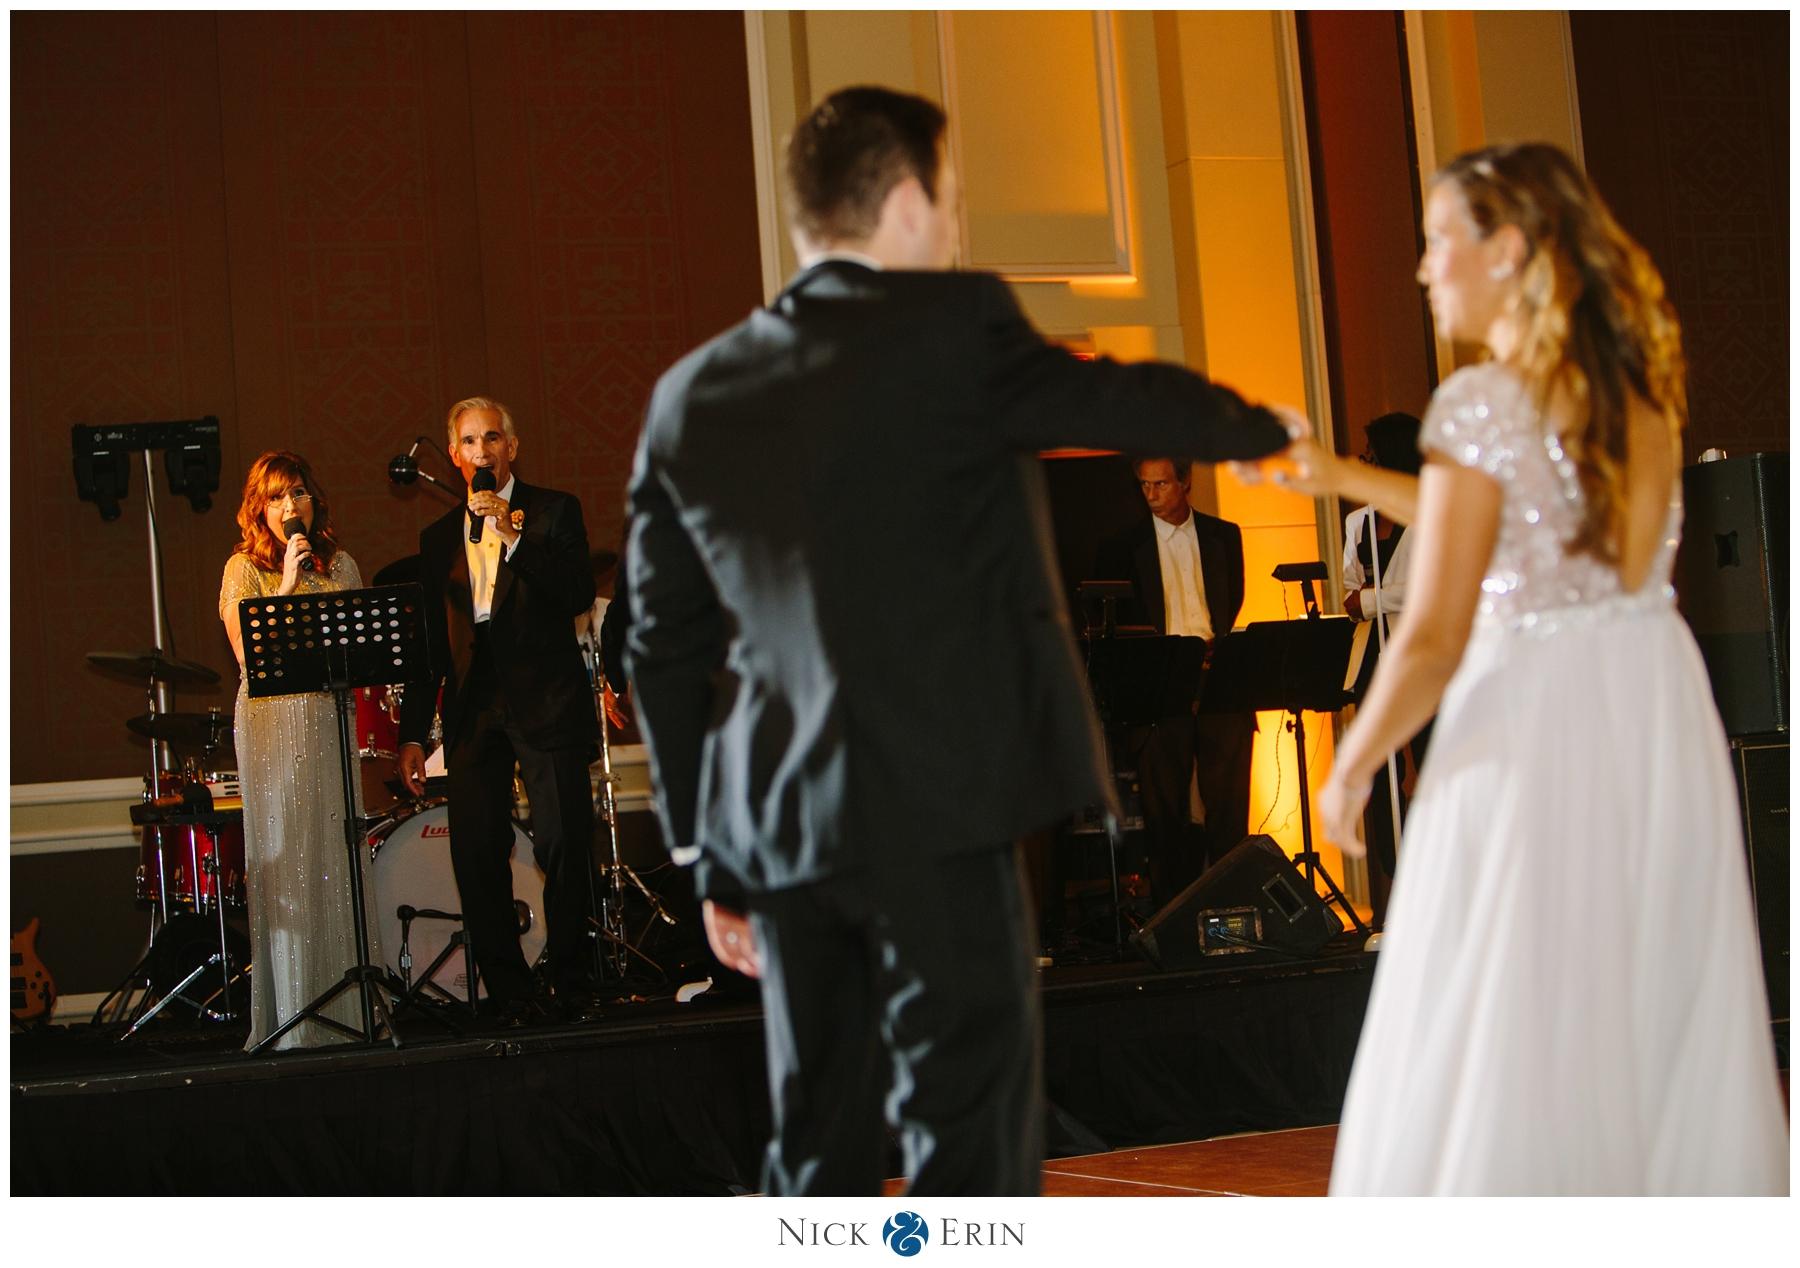 donner_photography_washington-dc-wedding_ariel-patrick_0067